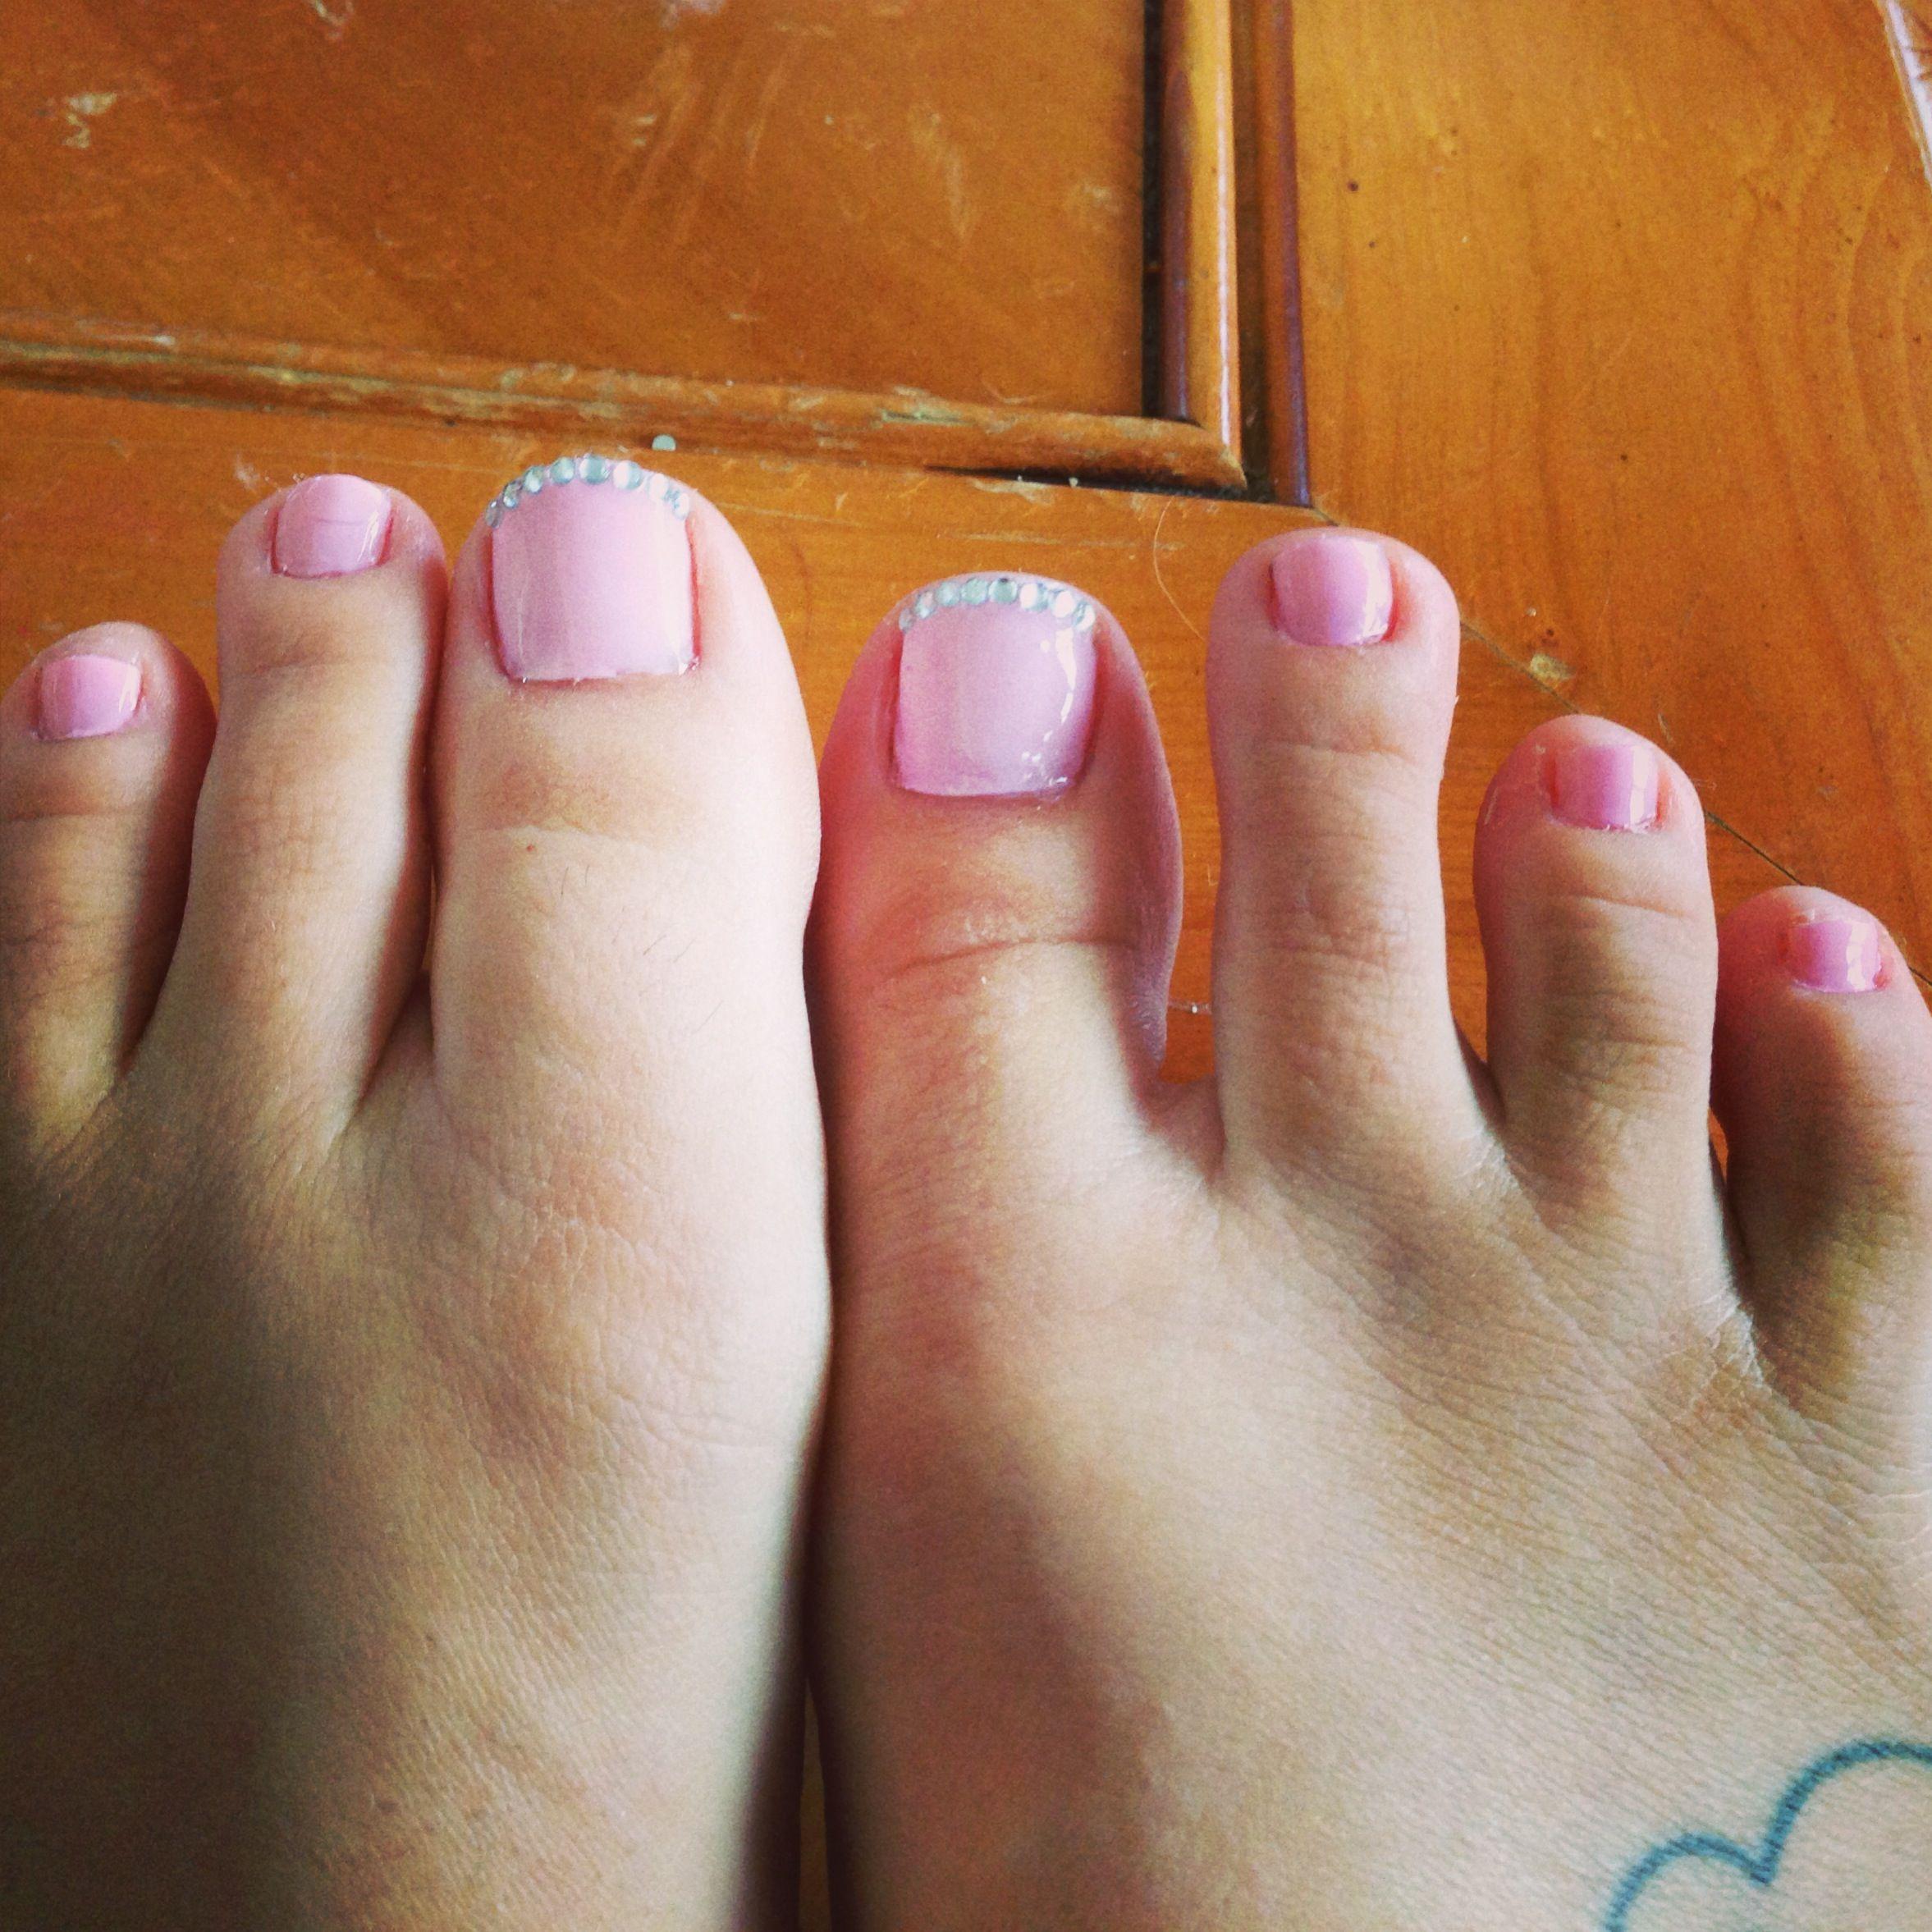 Toe nails Essie muchi, muchi | B-e-a-utiful | Pinterest | Nail nail ...